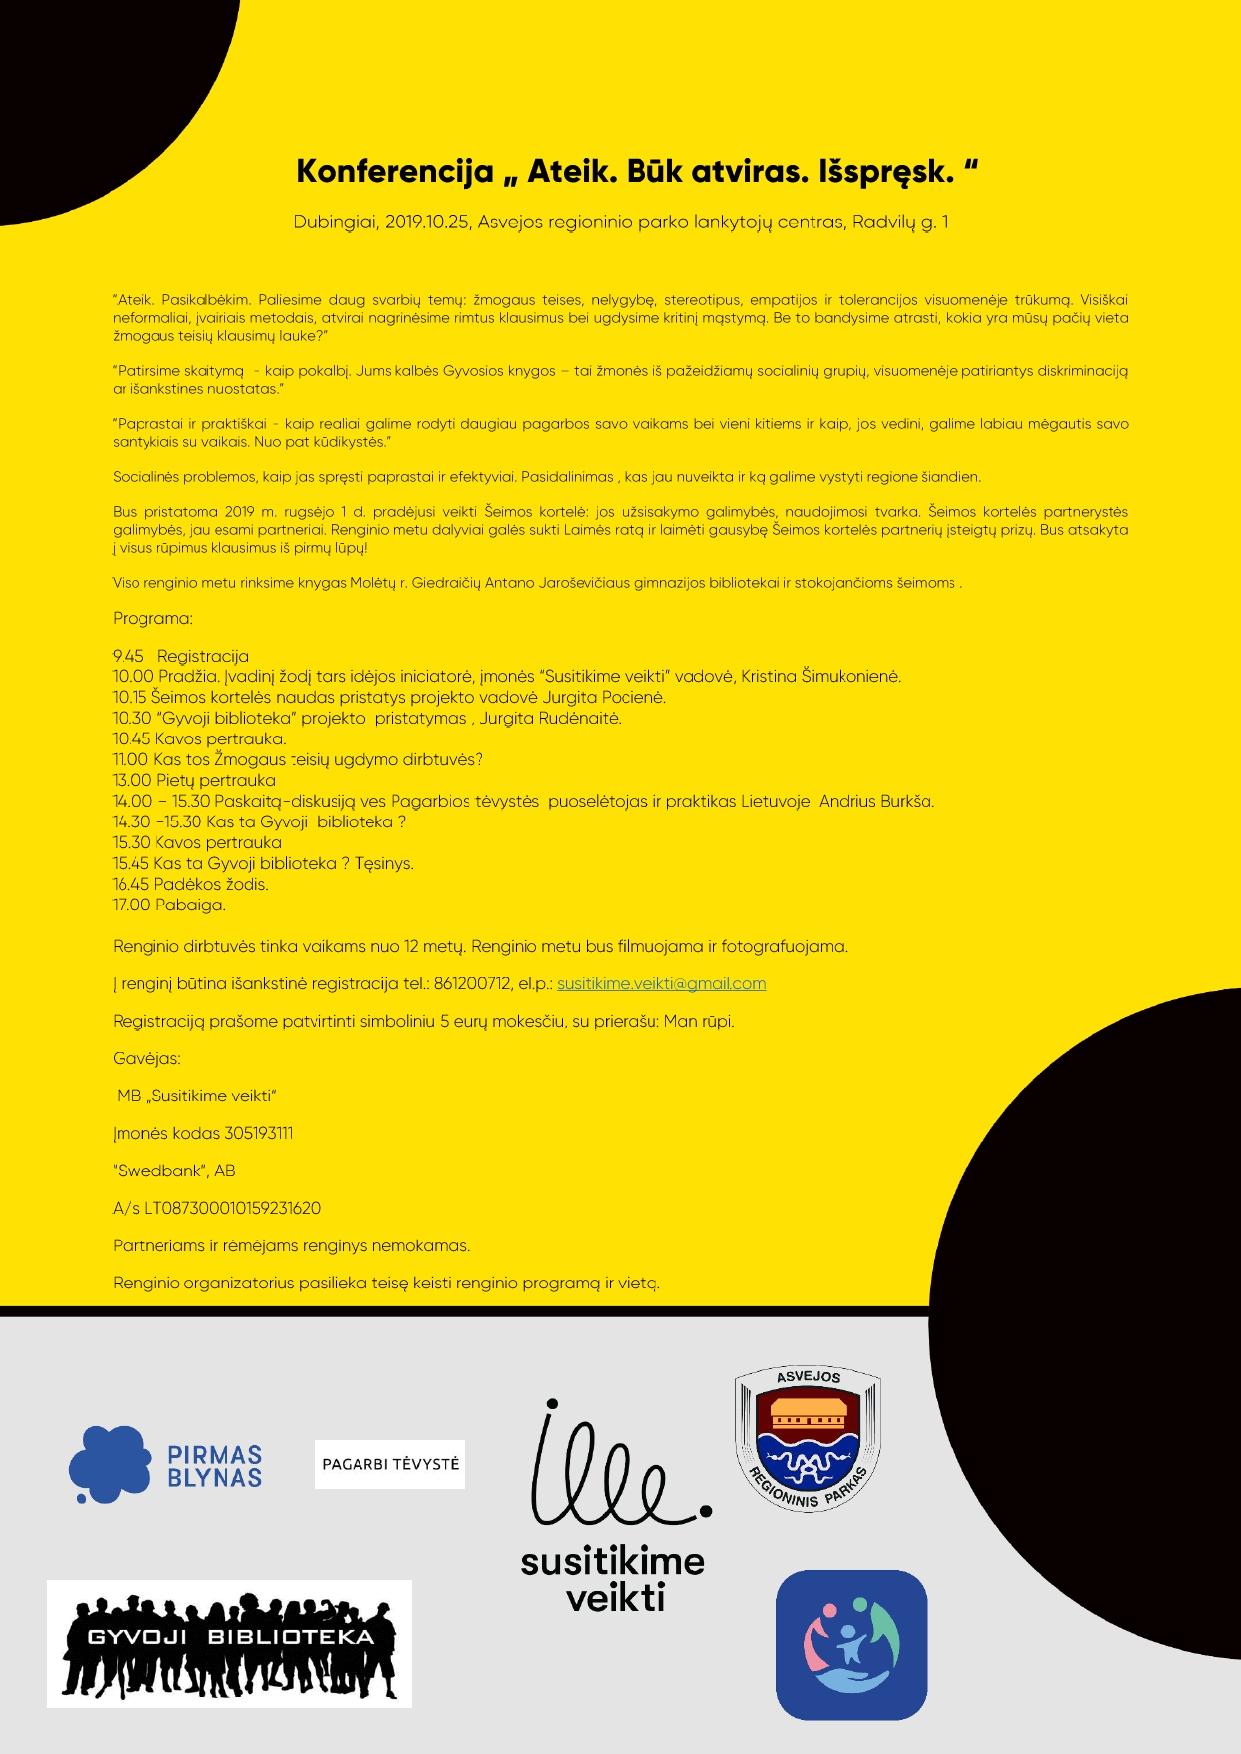 kvietimas-i-konferencija-dirbtuves-ateik-buk-atviras-isspresk-_page-0001